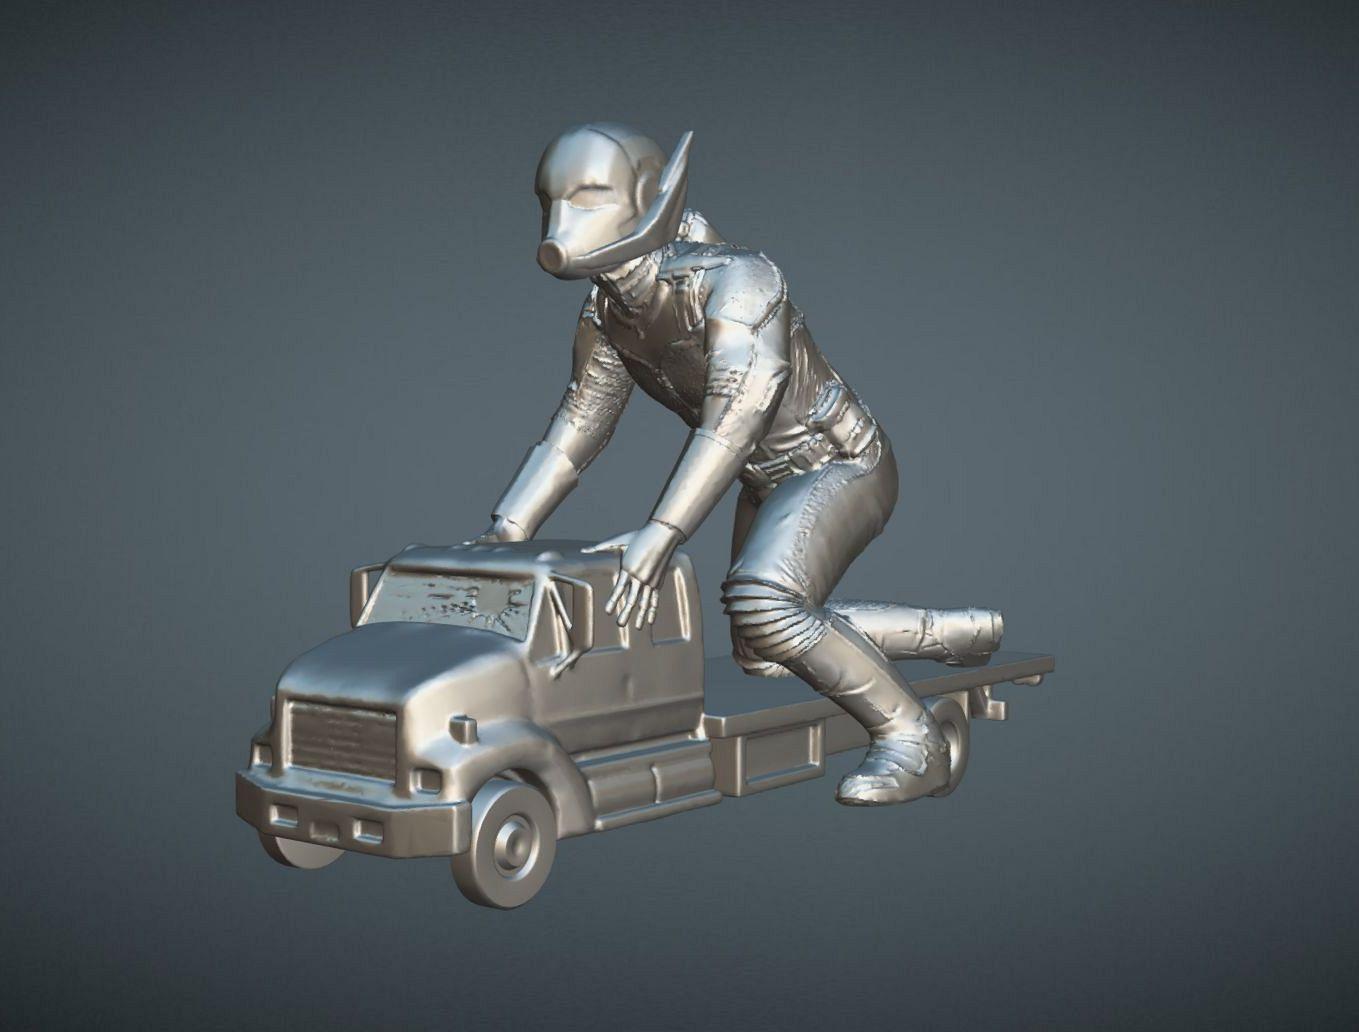 capture_05072018_175035.jpg Download OBJ file ANT-MAN 2 INSPIRITED MODEL • 3D print template, Masterclip